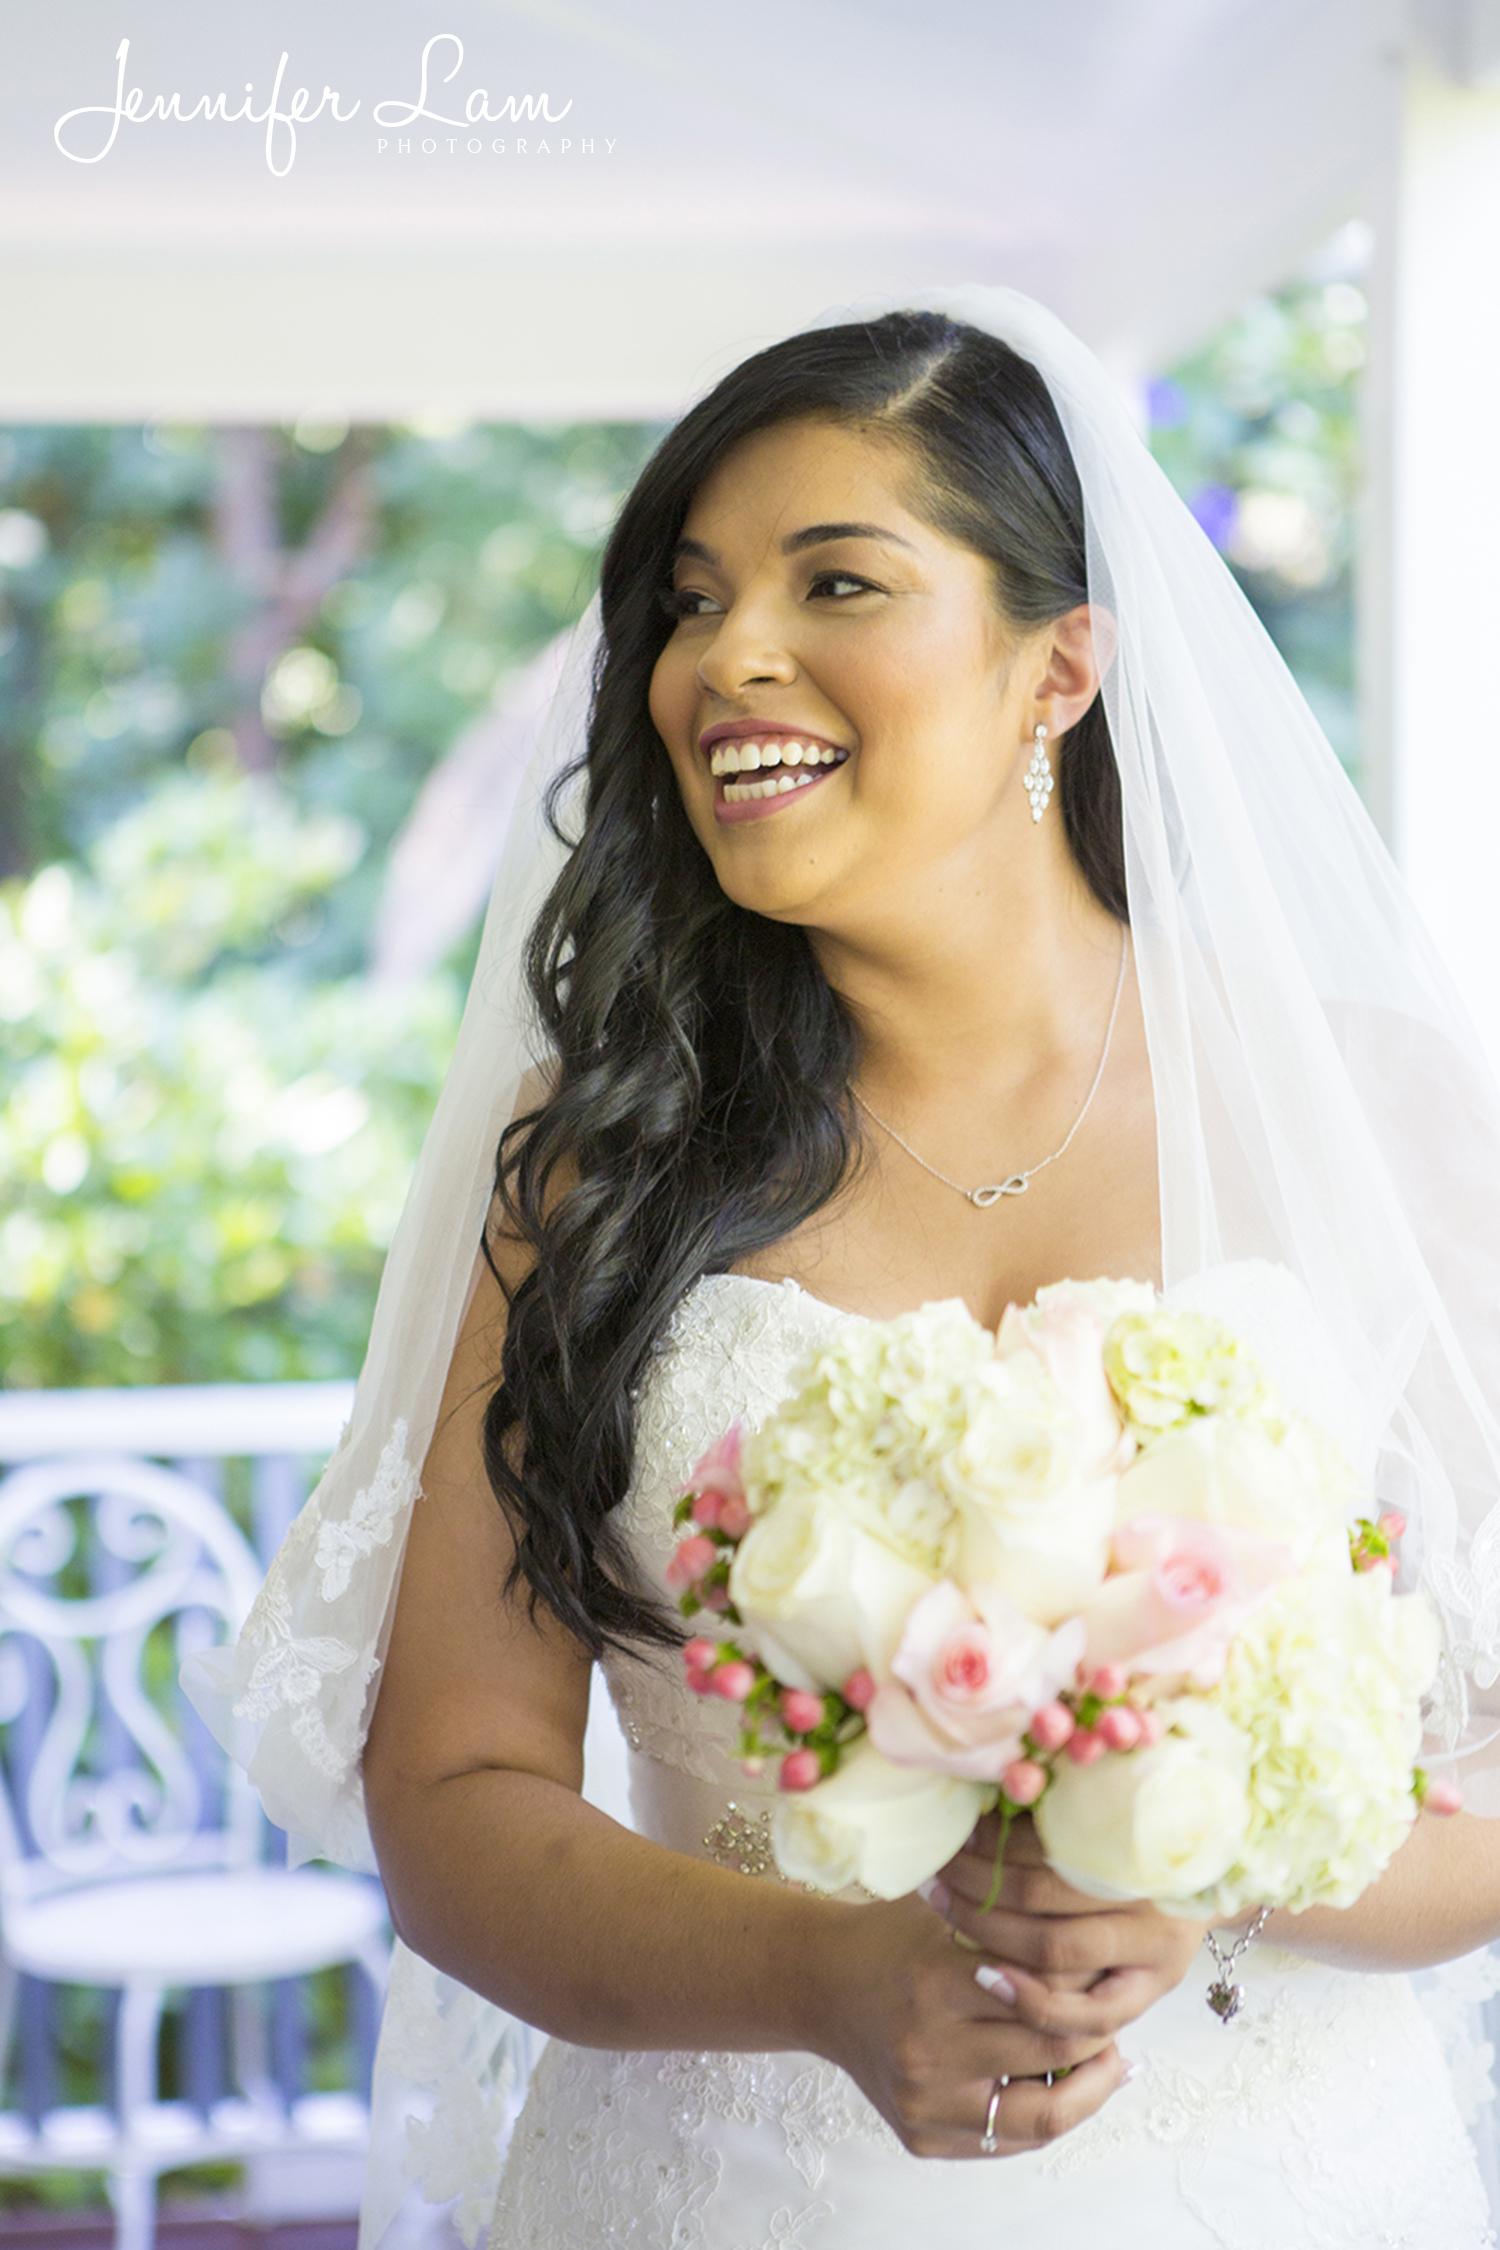 Sydney Wedding Photographer - Jennifer Lam Photography - www.jenniferlamphotography (17).jpg